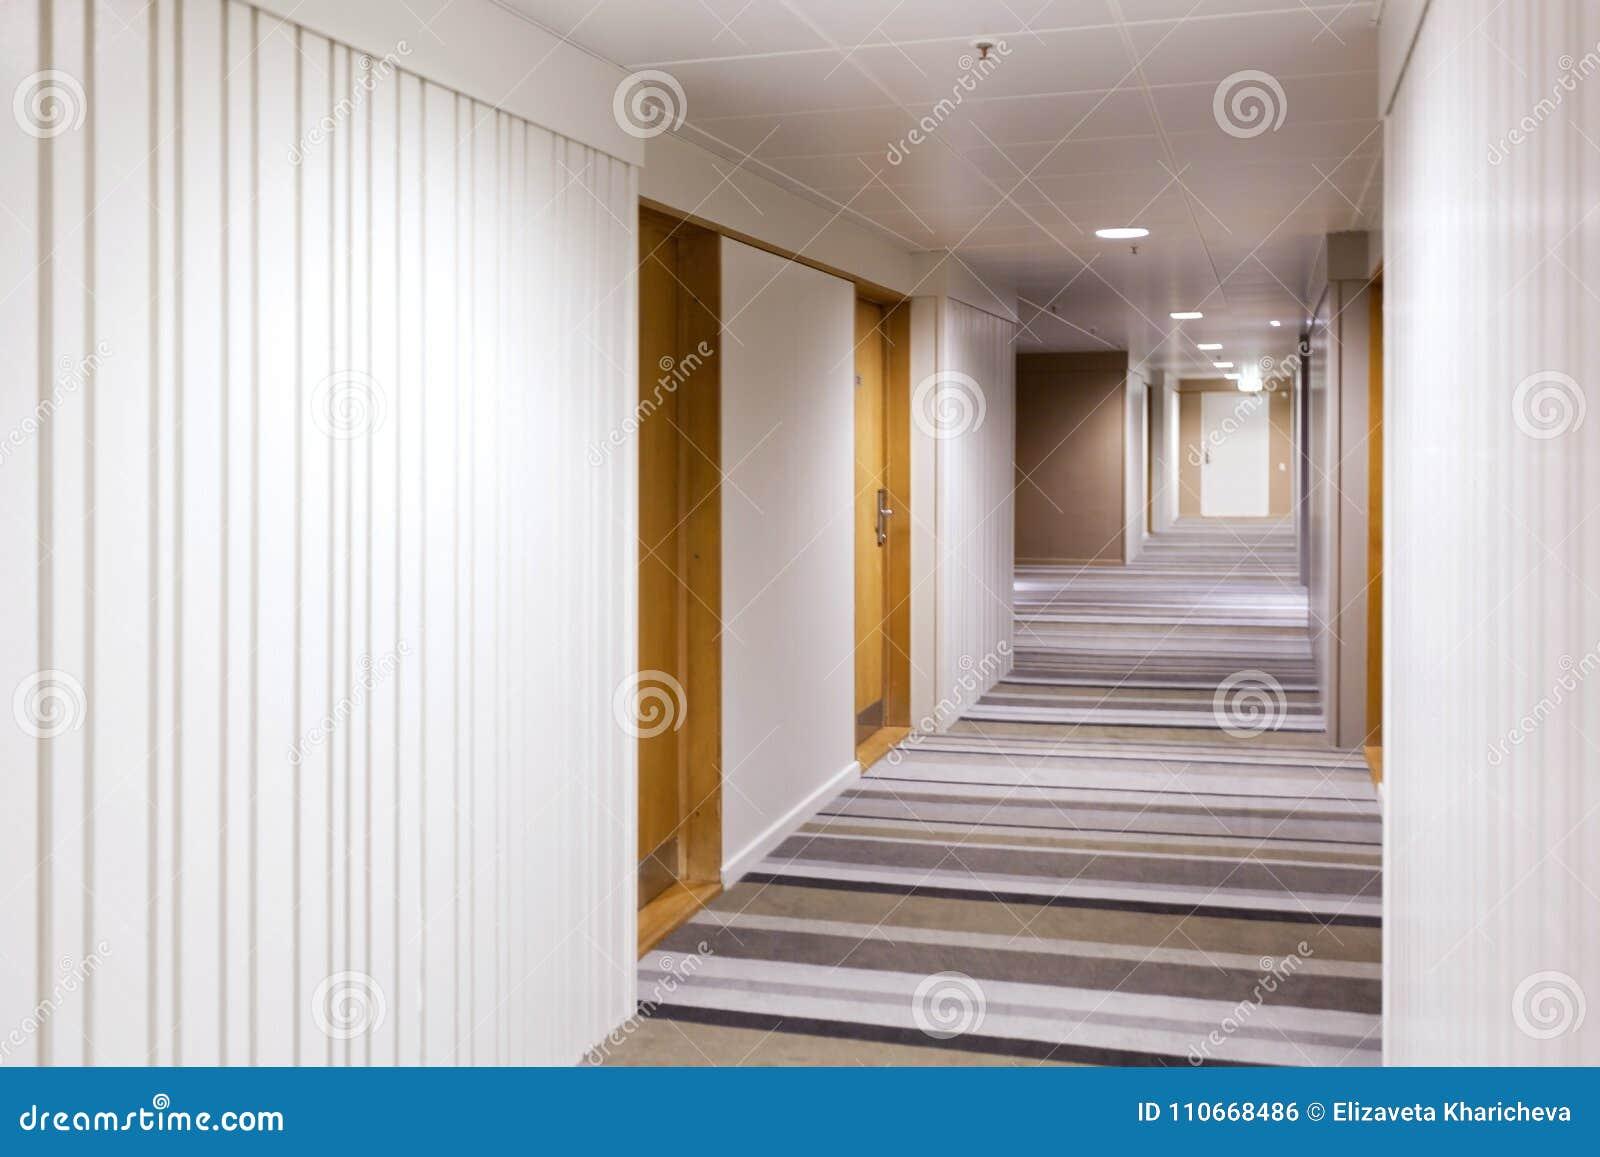 Modern Interior Design Of The Corridor Stock Photo